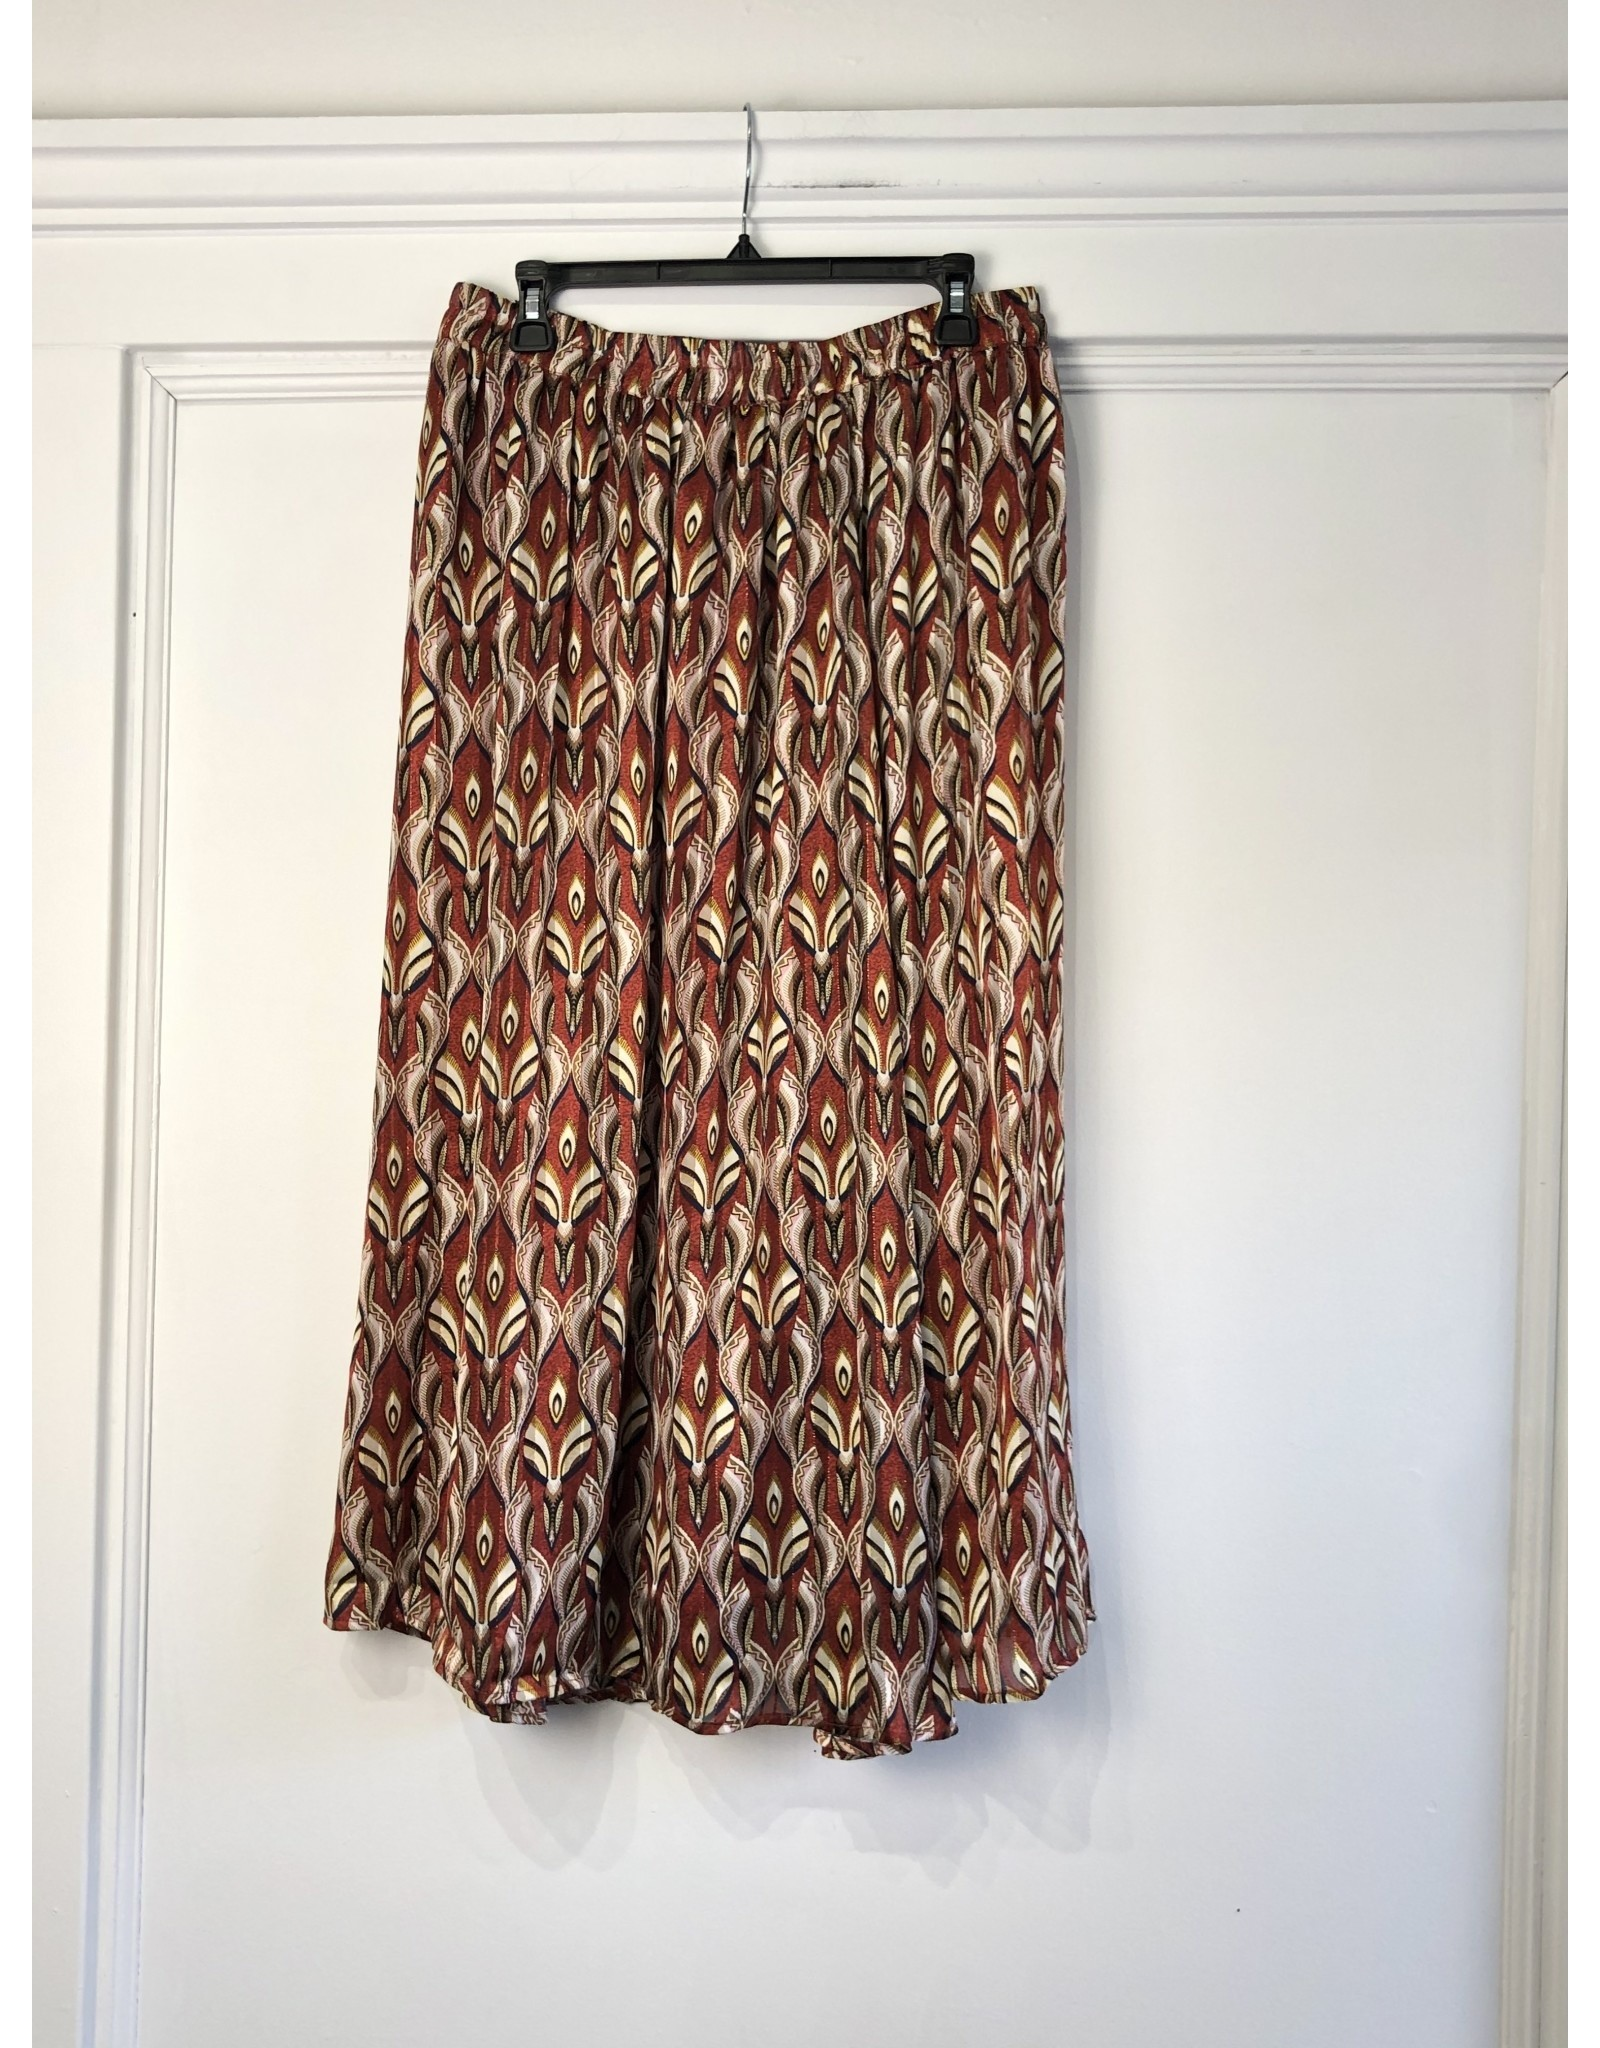 Korner Korner - Ramona maxi skirt (brick)